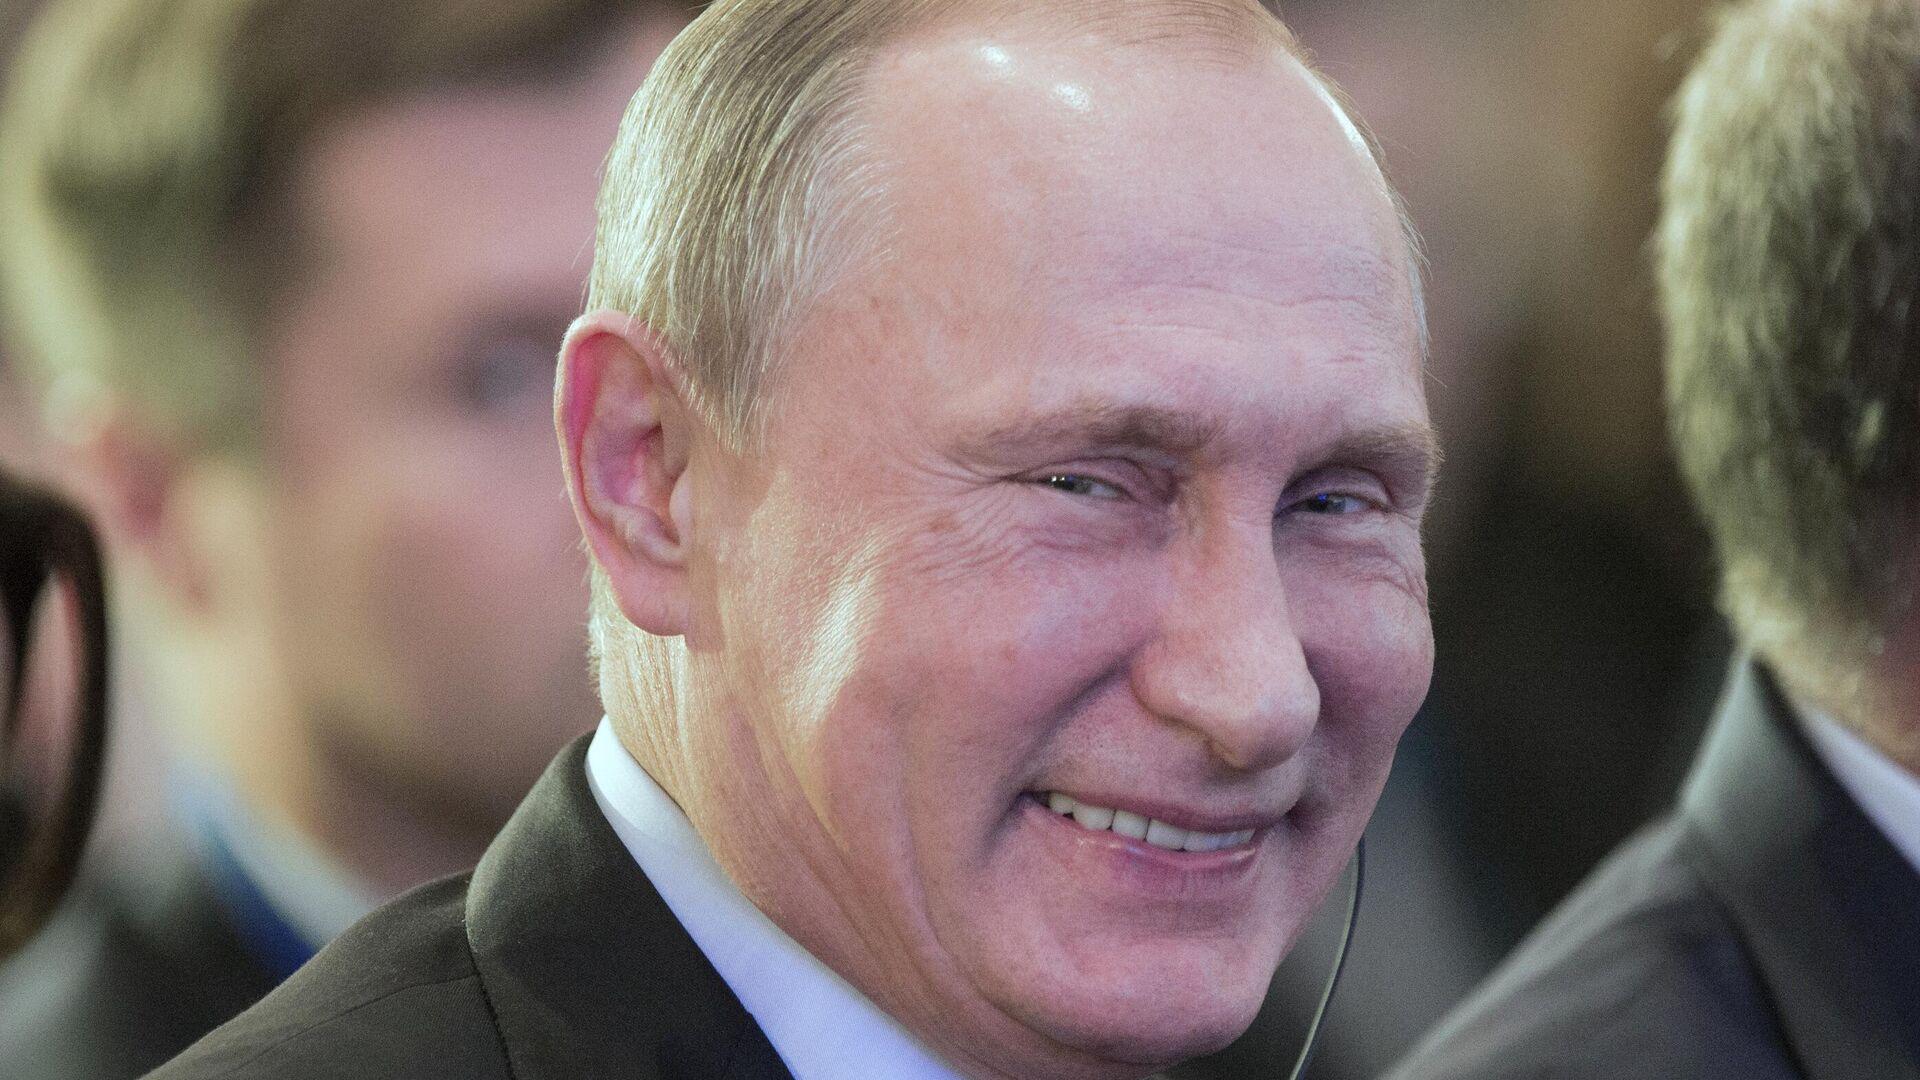 Vladímir Putin, presidente de Rusia - Sputnik Mundo, 1920, 07.10.2021